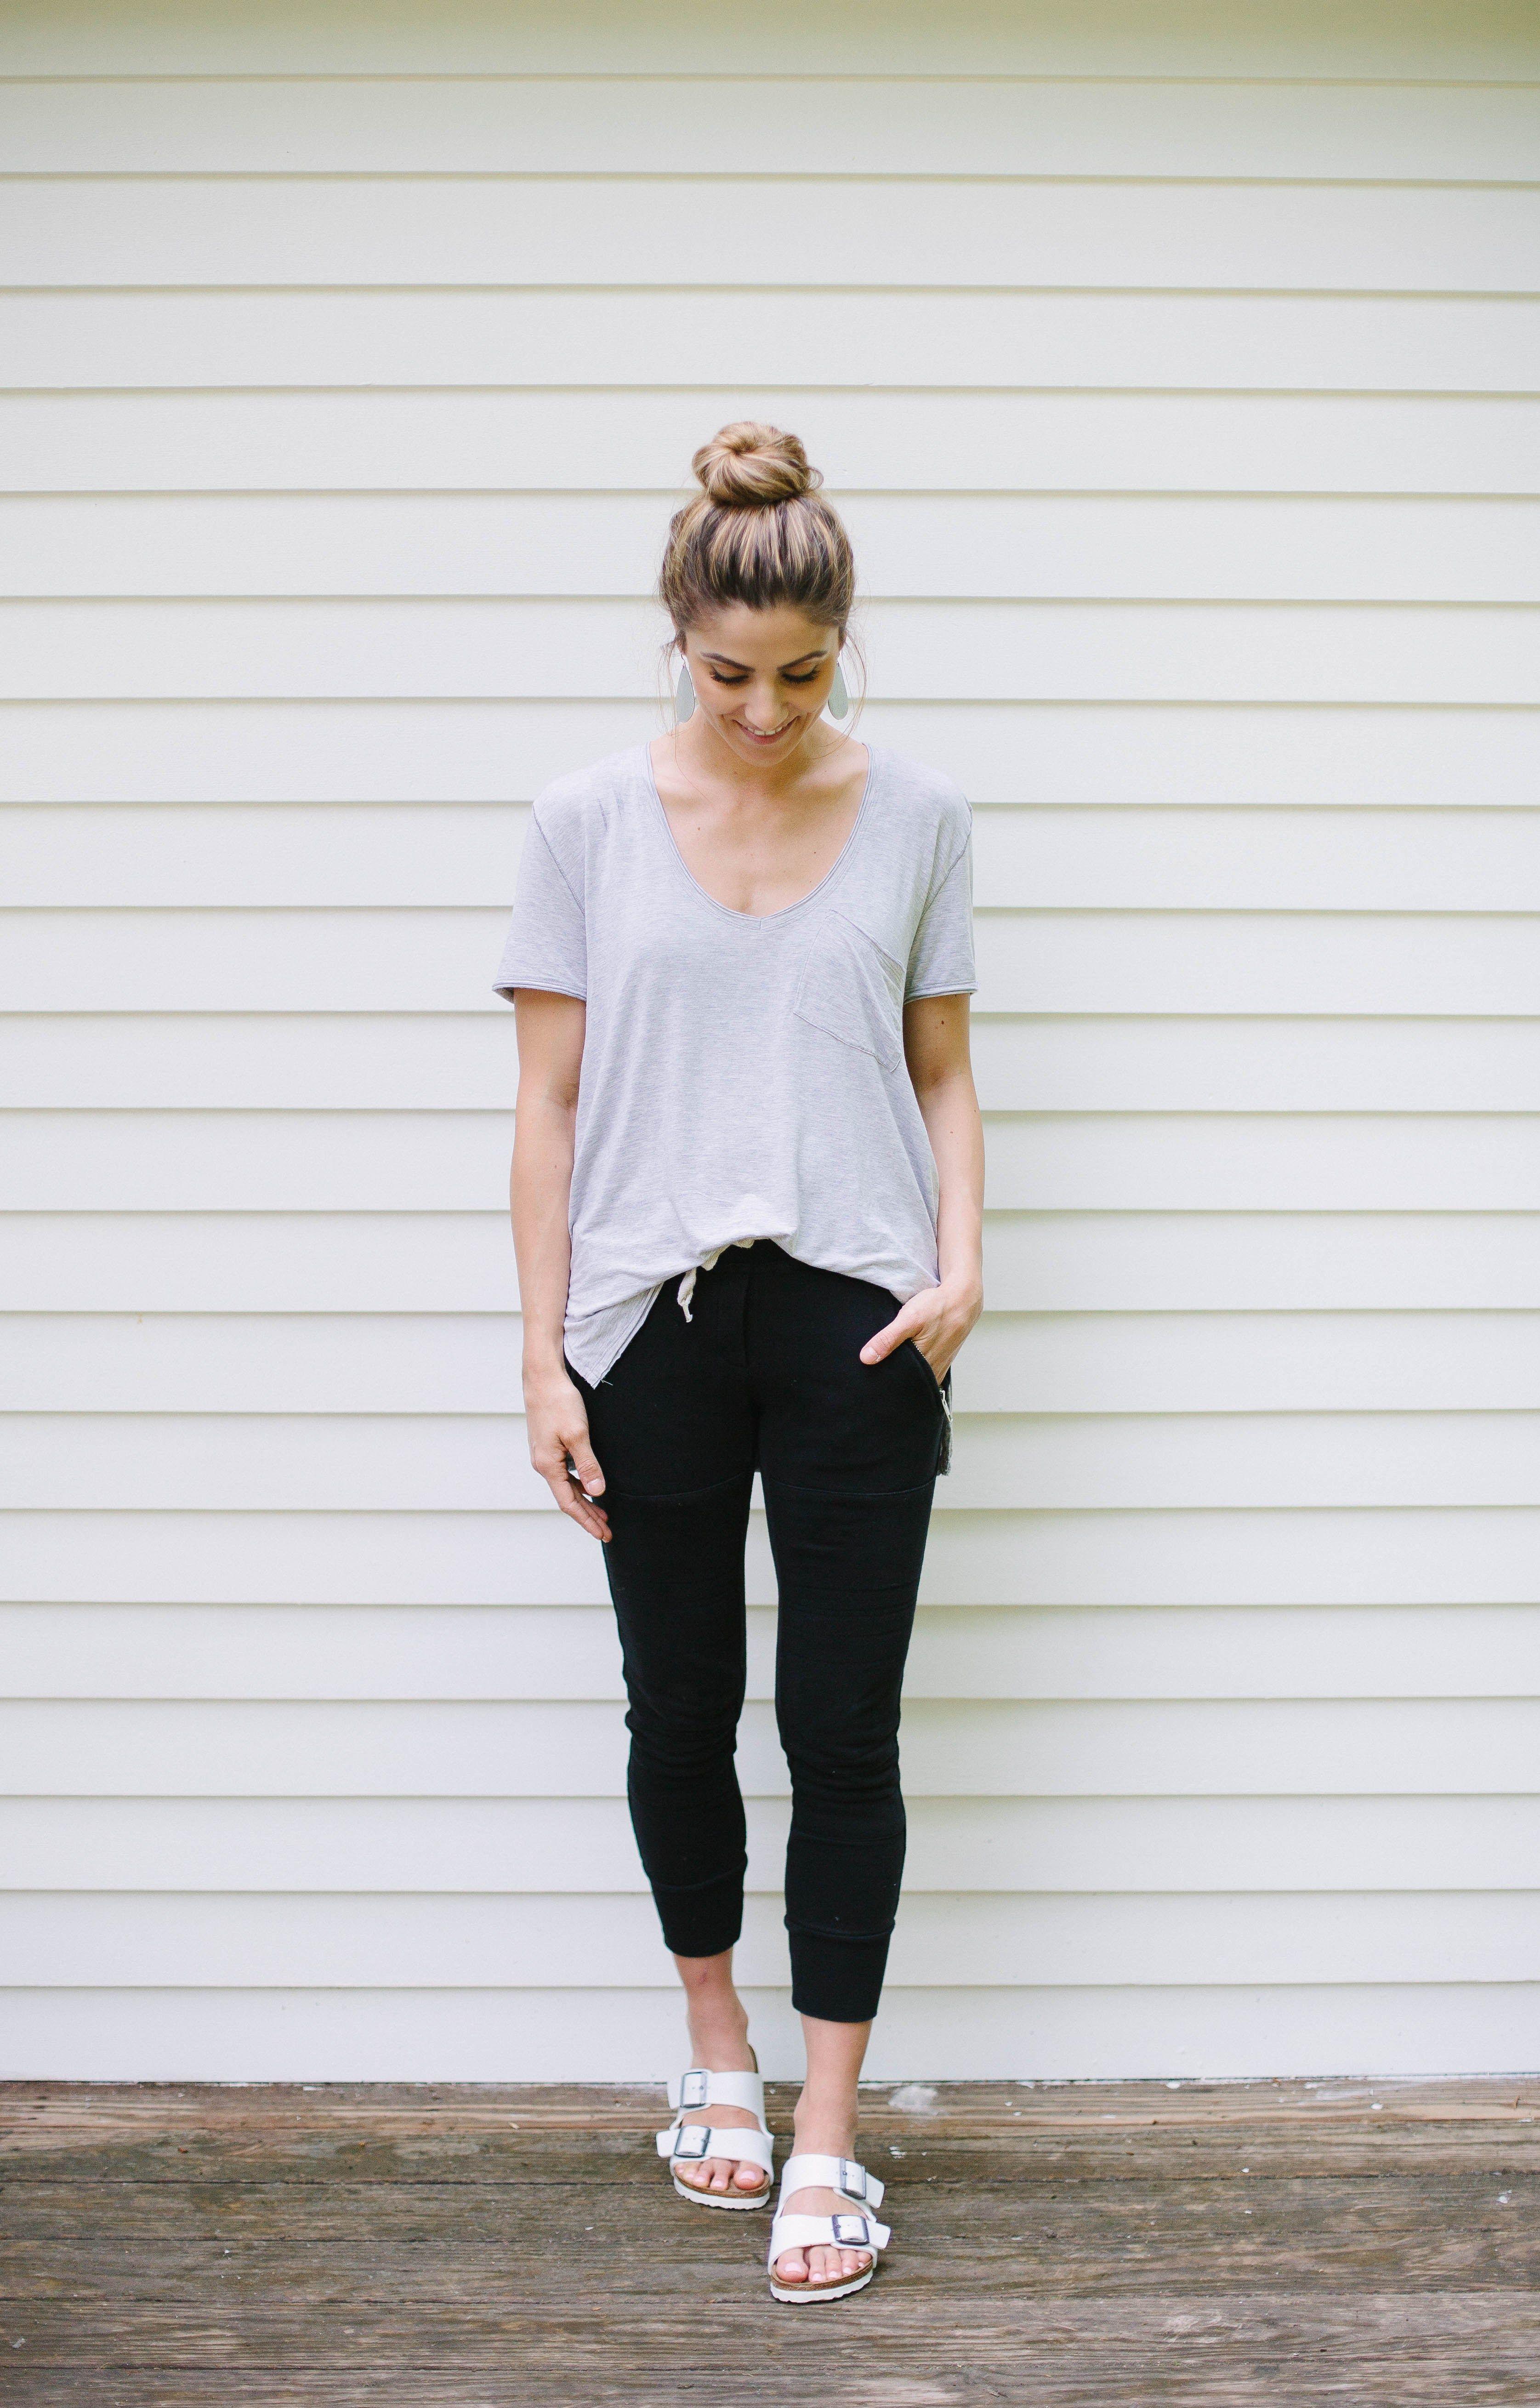 7 Ways to Style Birkenstocks Without Looking Like a Berkeley Mom